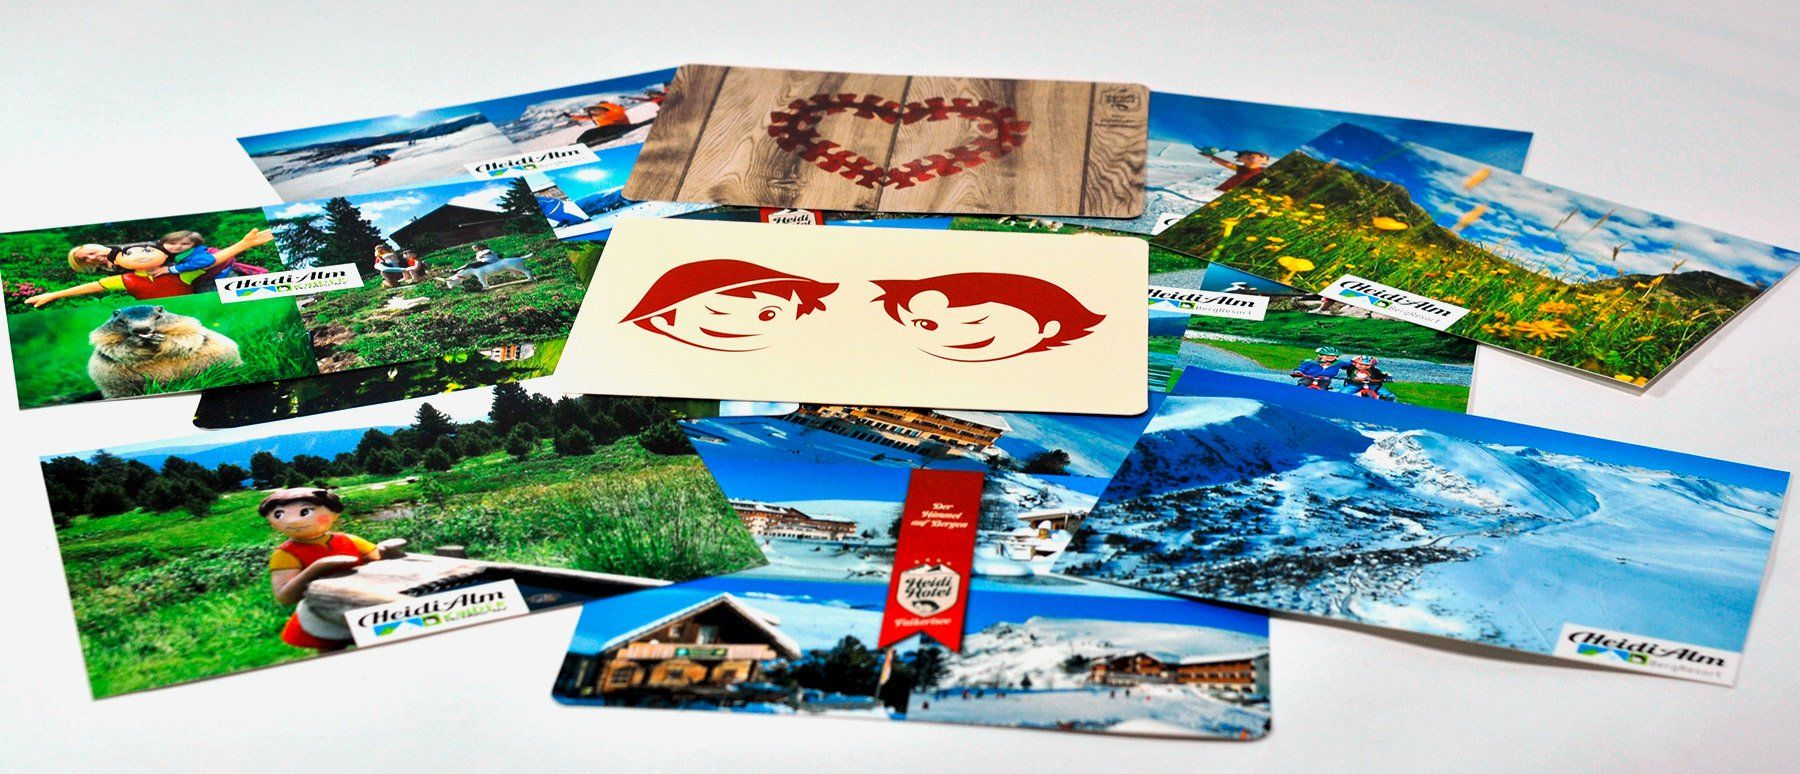 Postkarten Heidi-Hotel